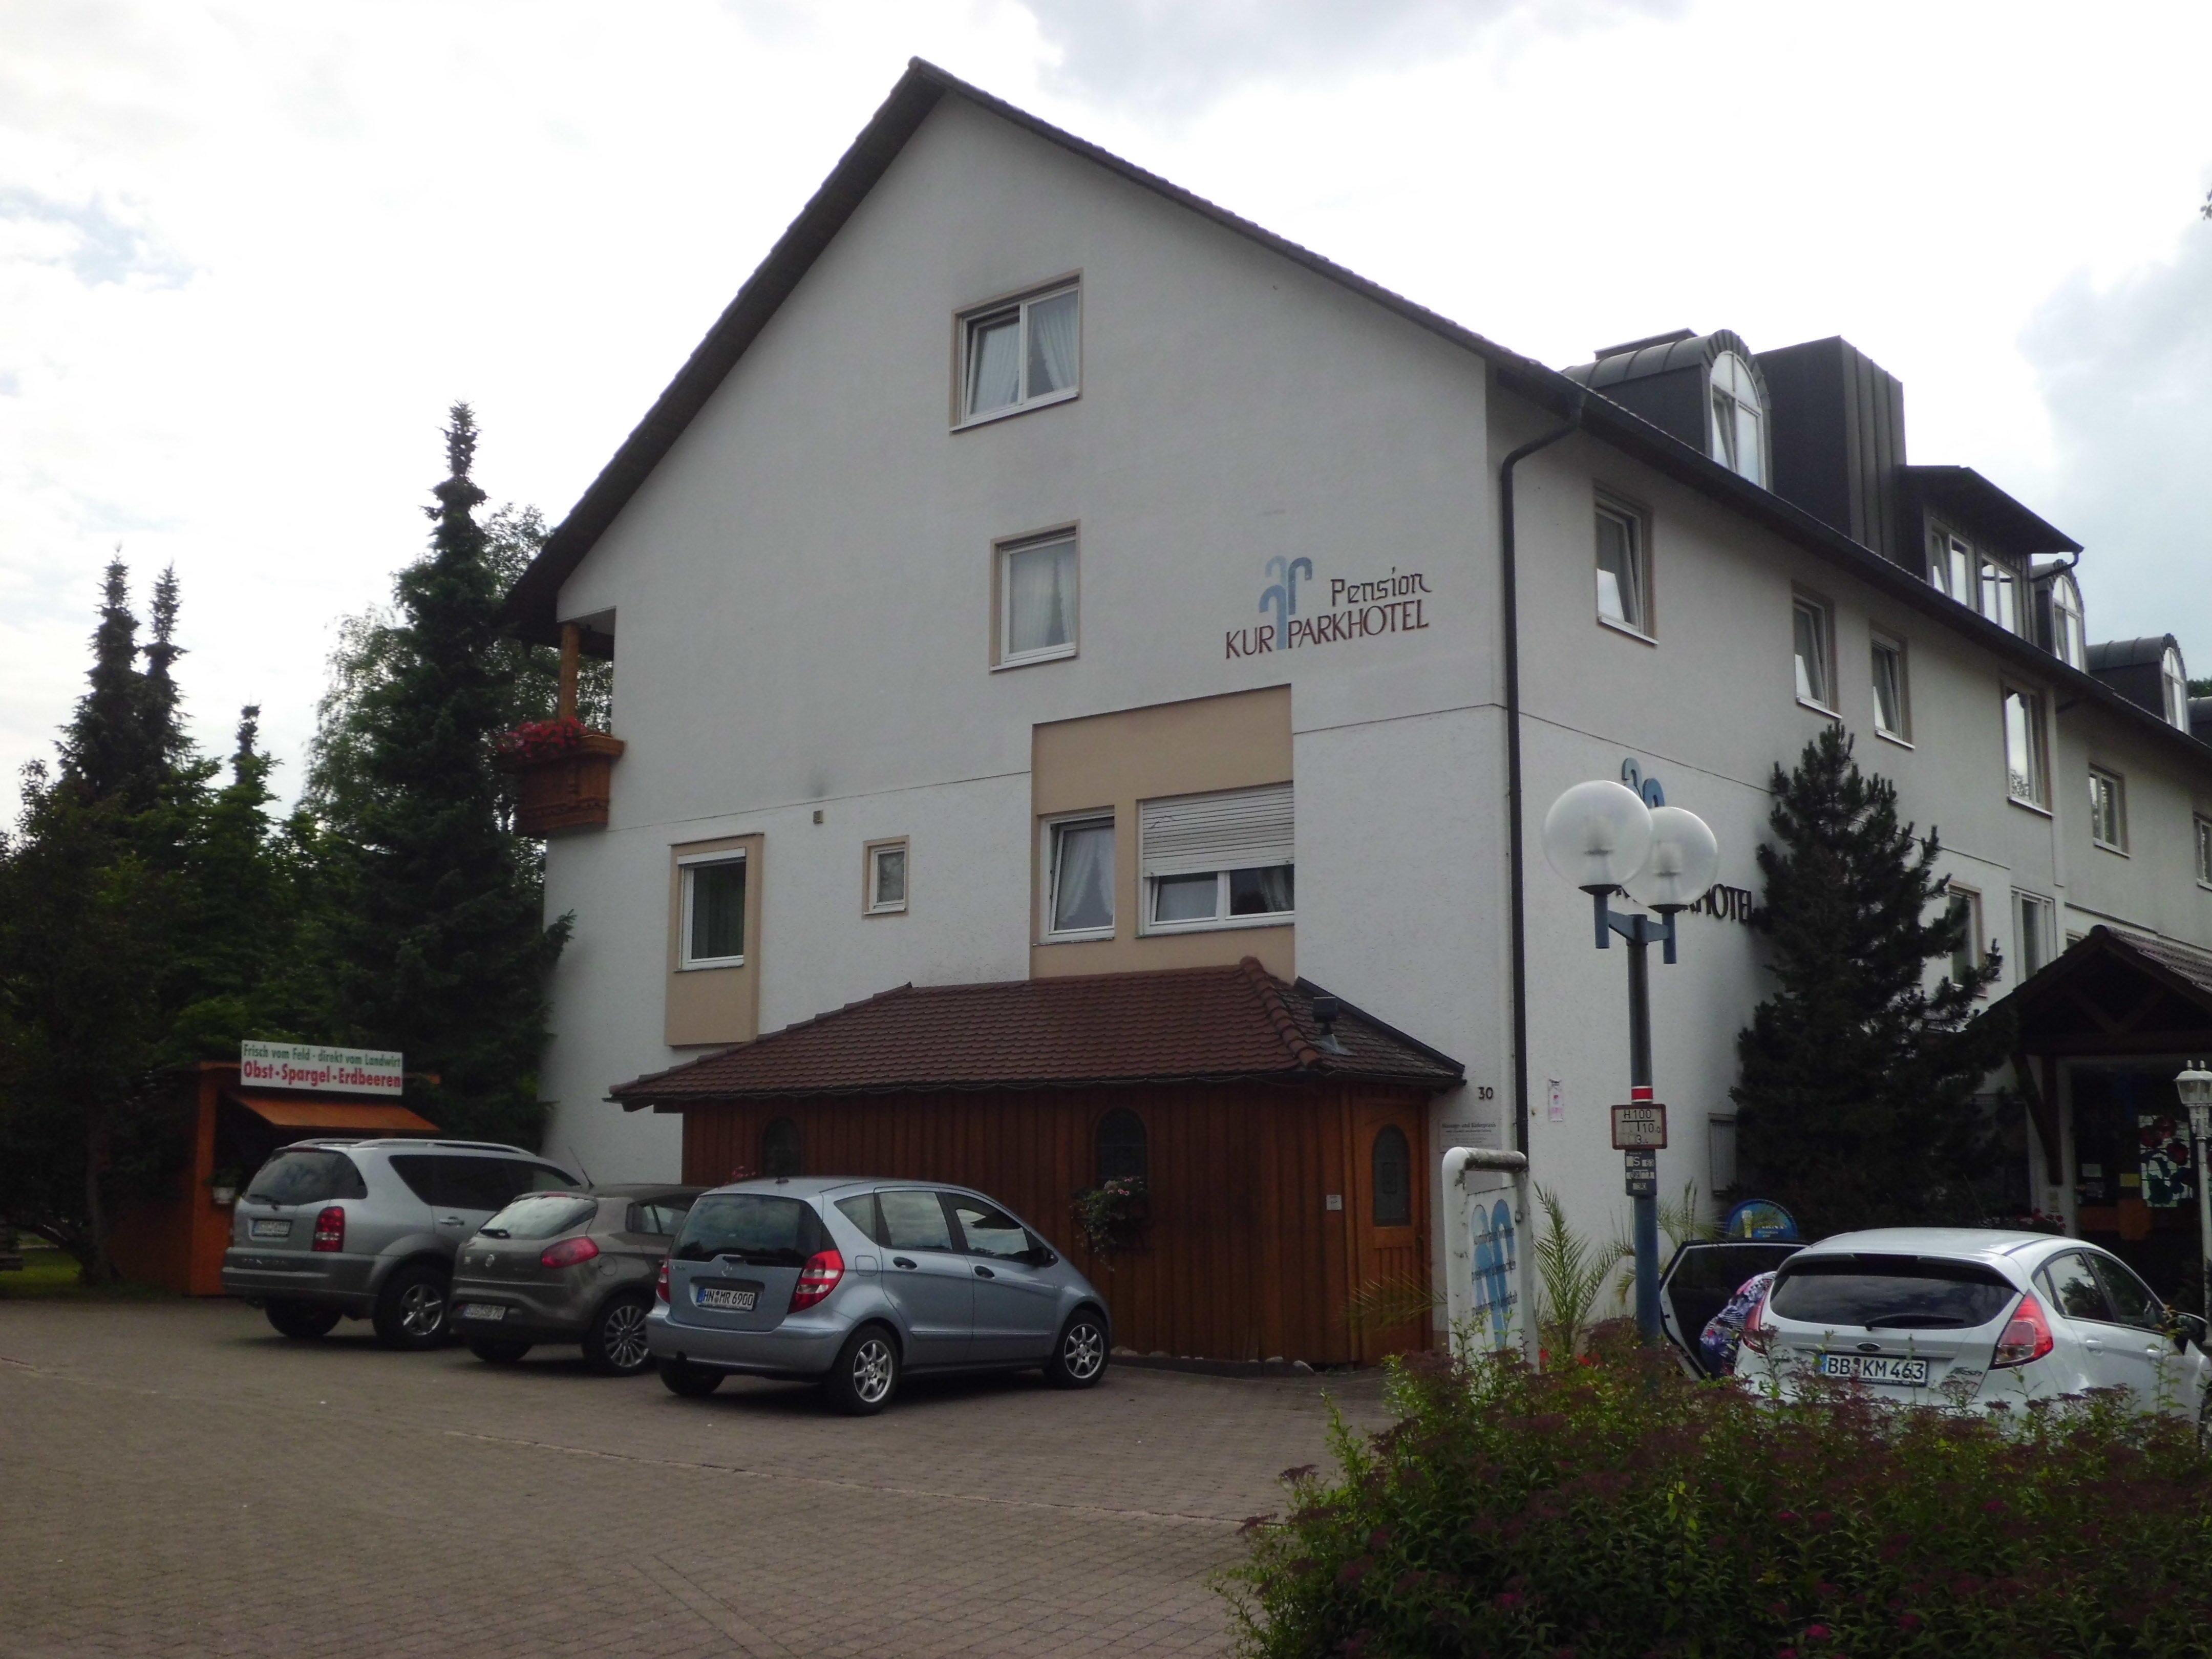 kurparkhotel in bad waldsee holidaycheck baden w rttemberg deutschland. Black Bedroom Furniture Sets. Home Design Ideas